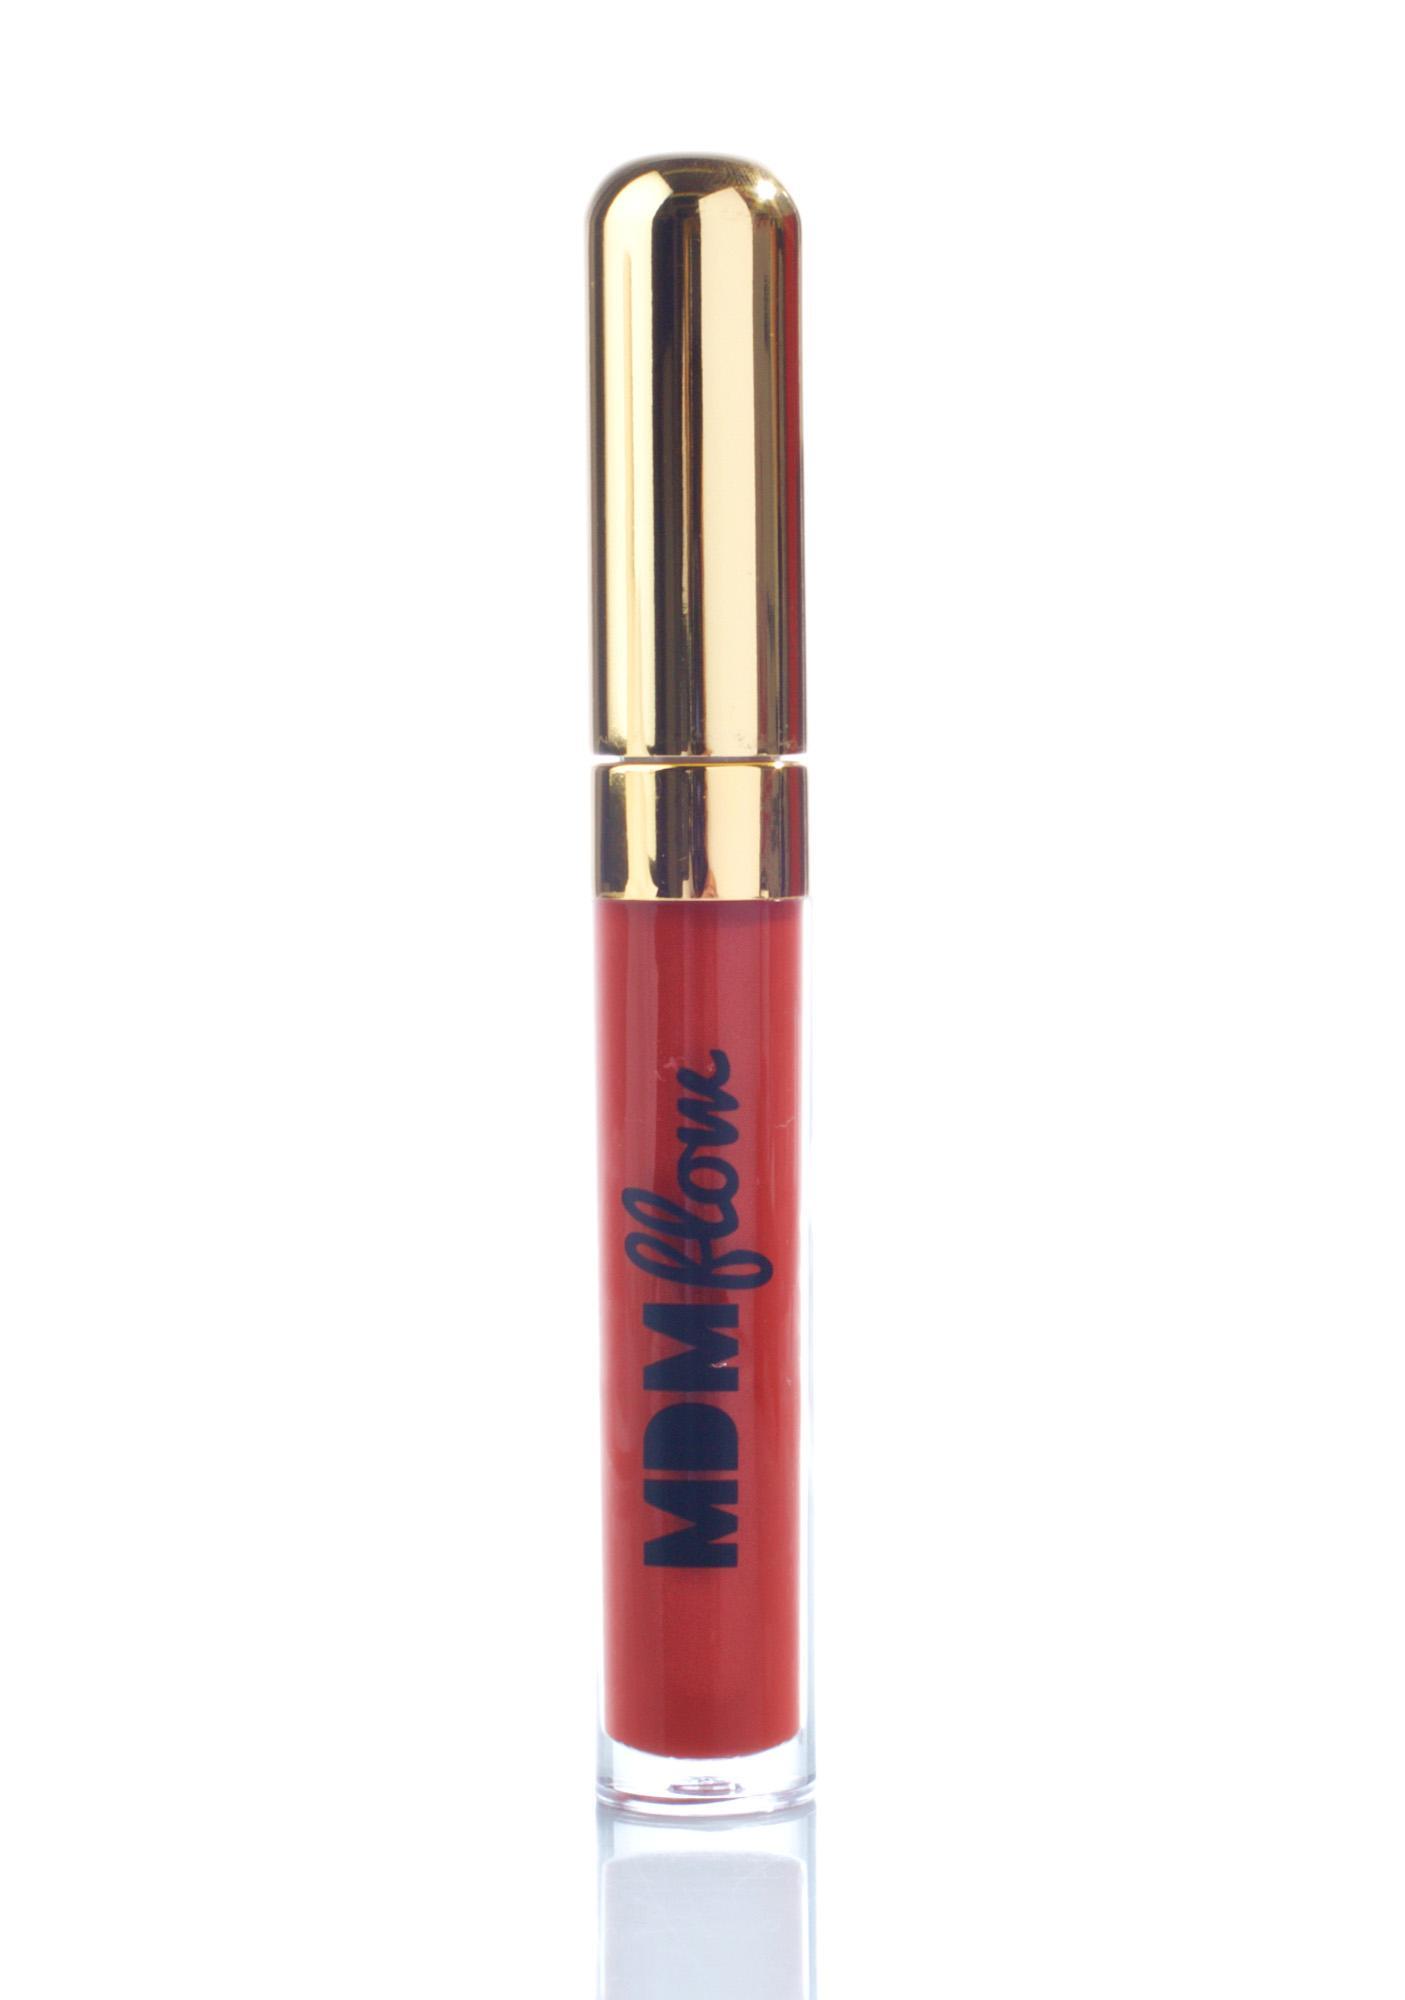 MDMflow Ninety Four Liquid Matte Lipstick